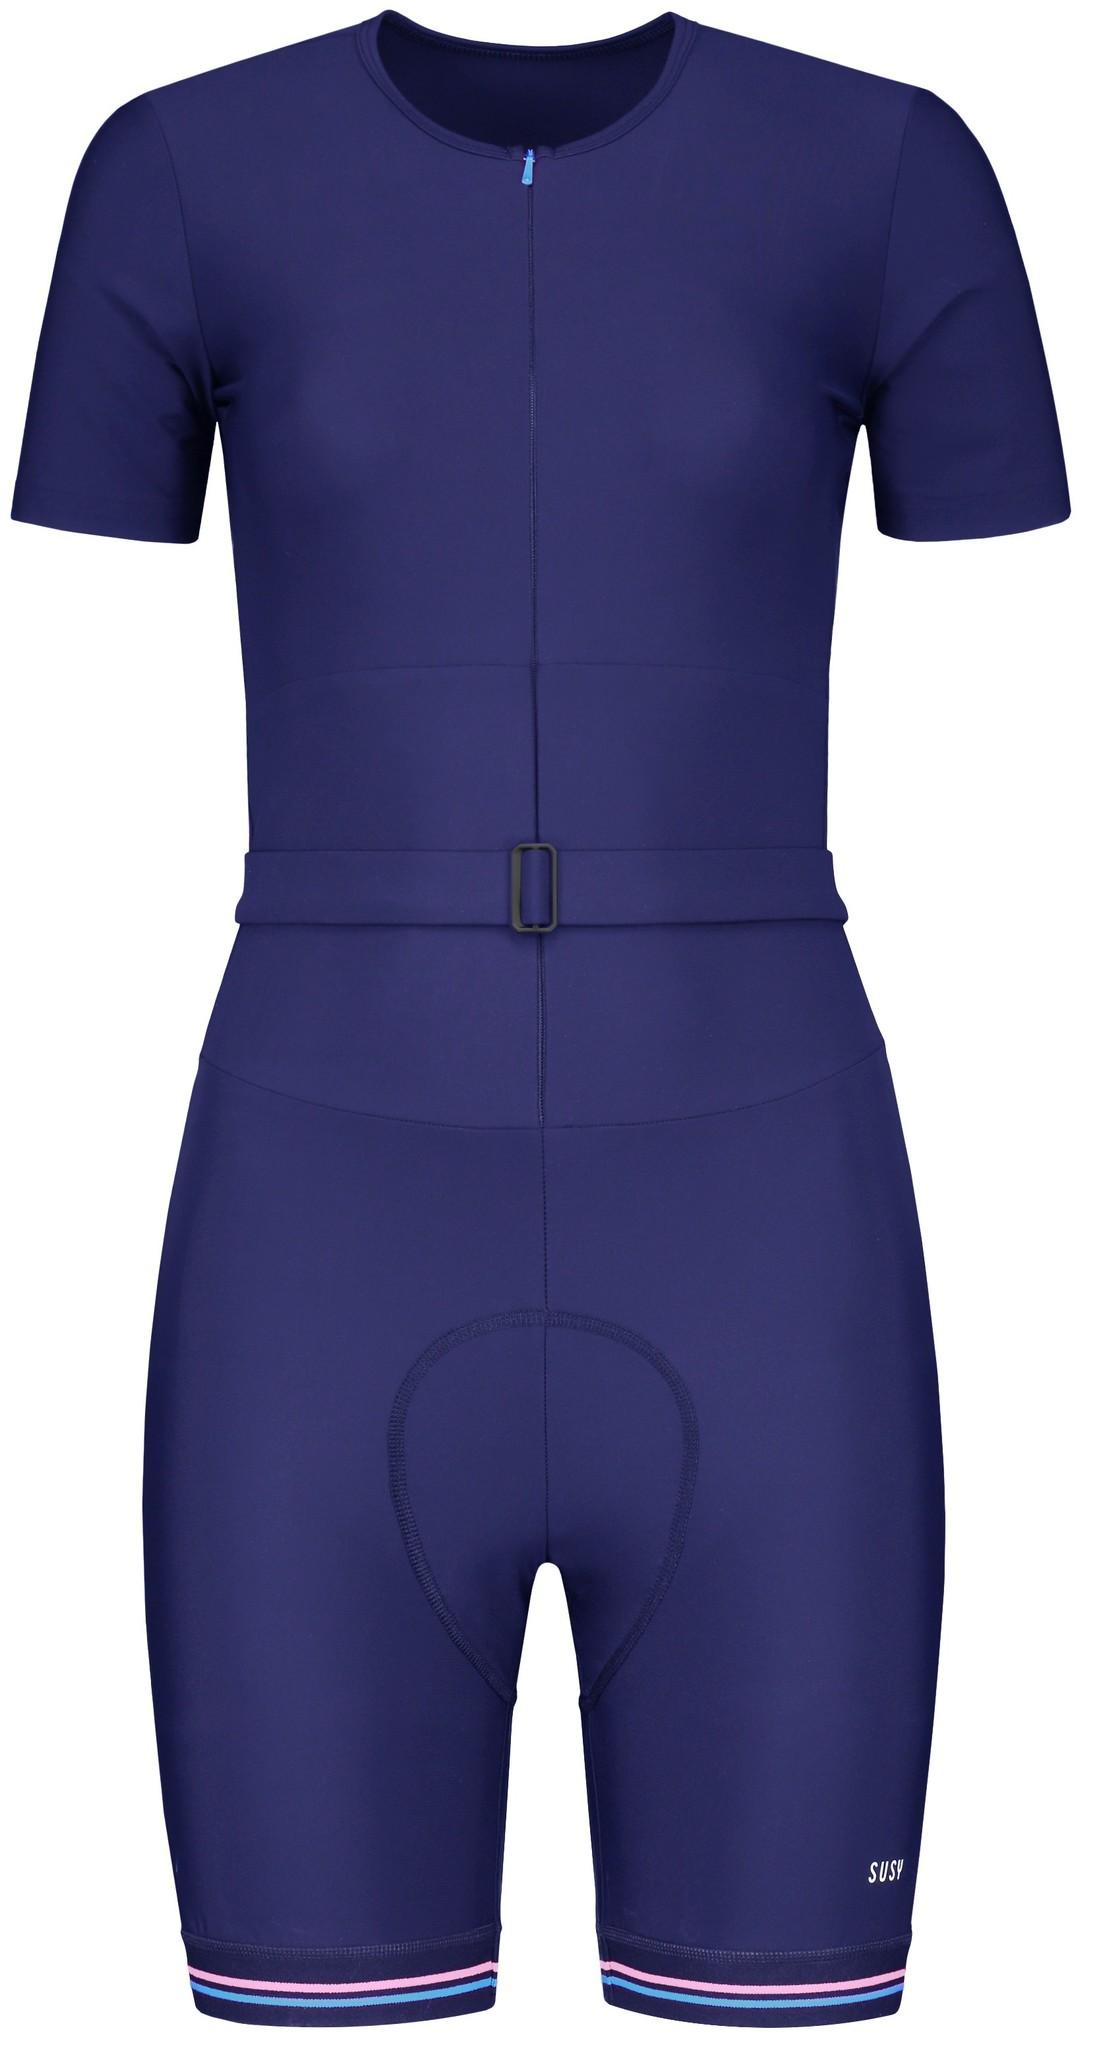 Women's cyclingsuit - Navy